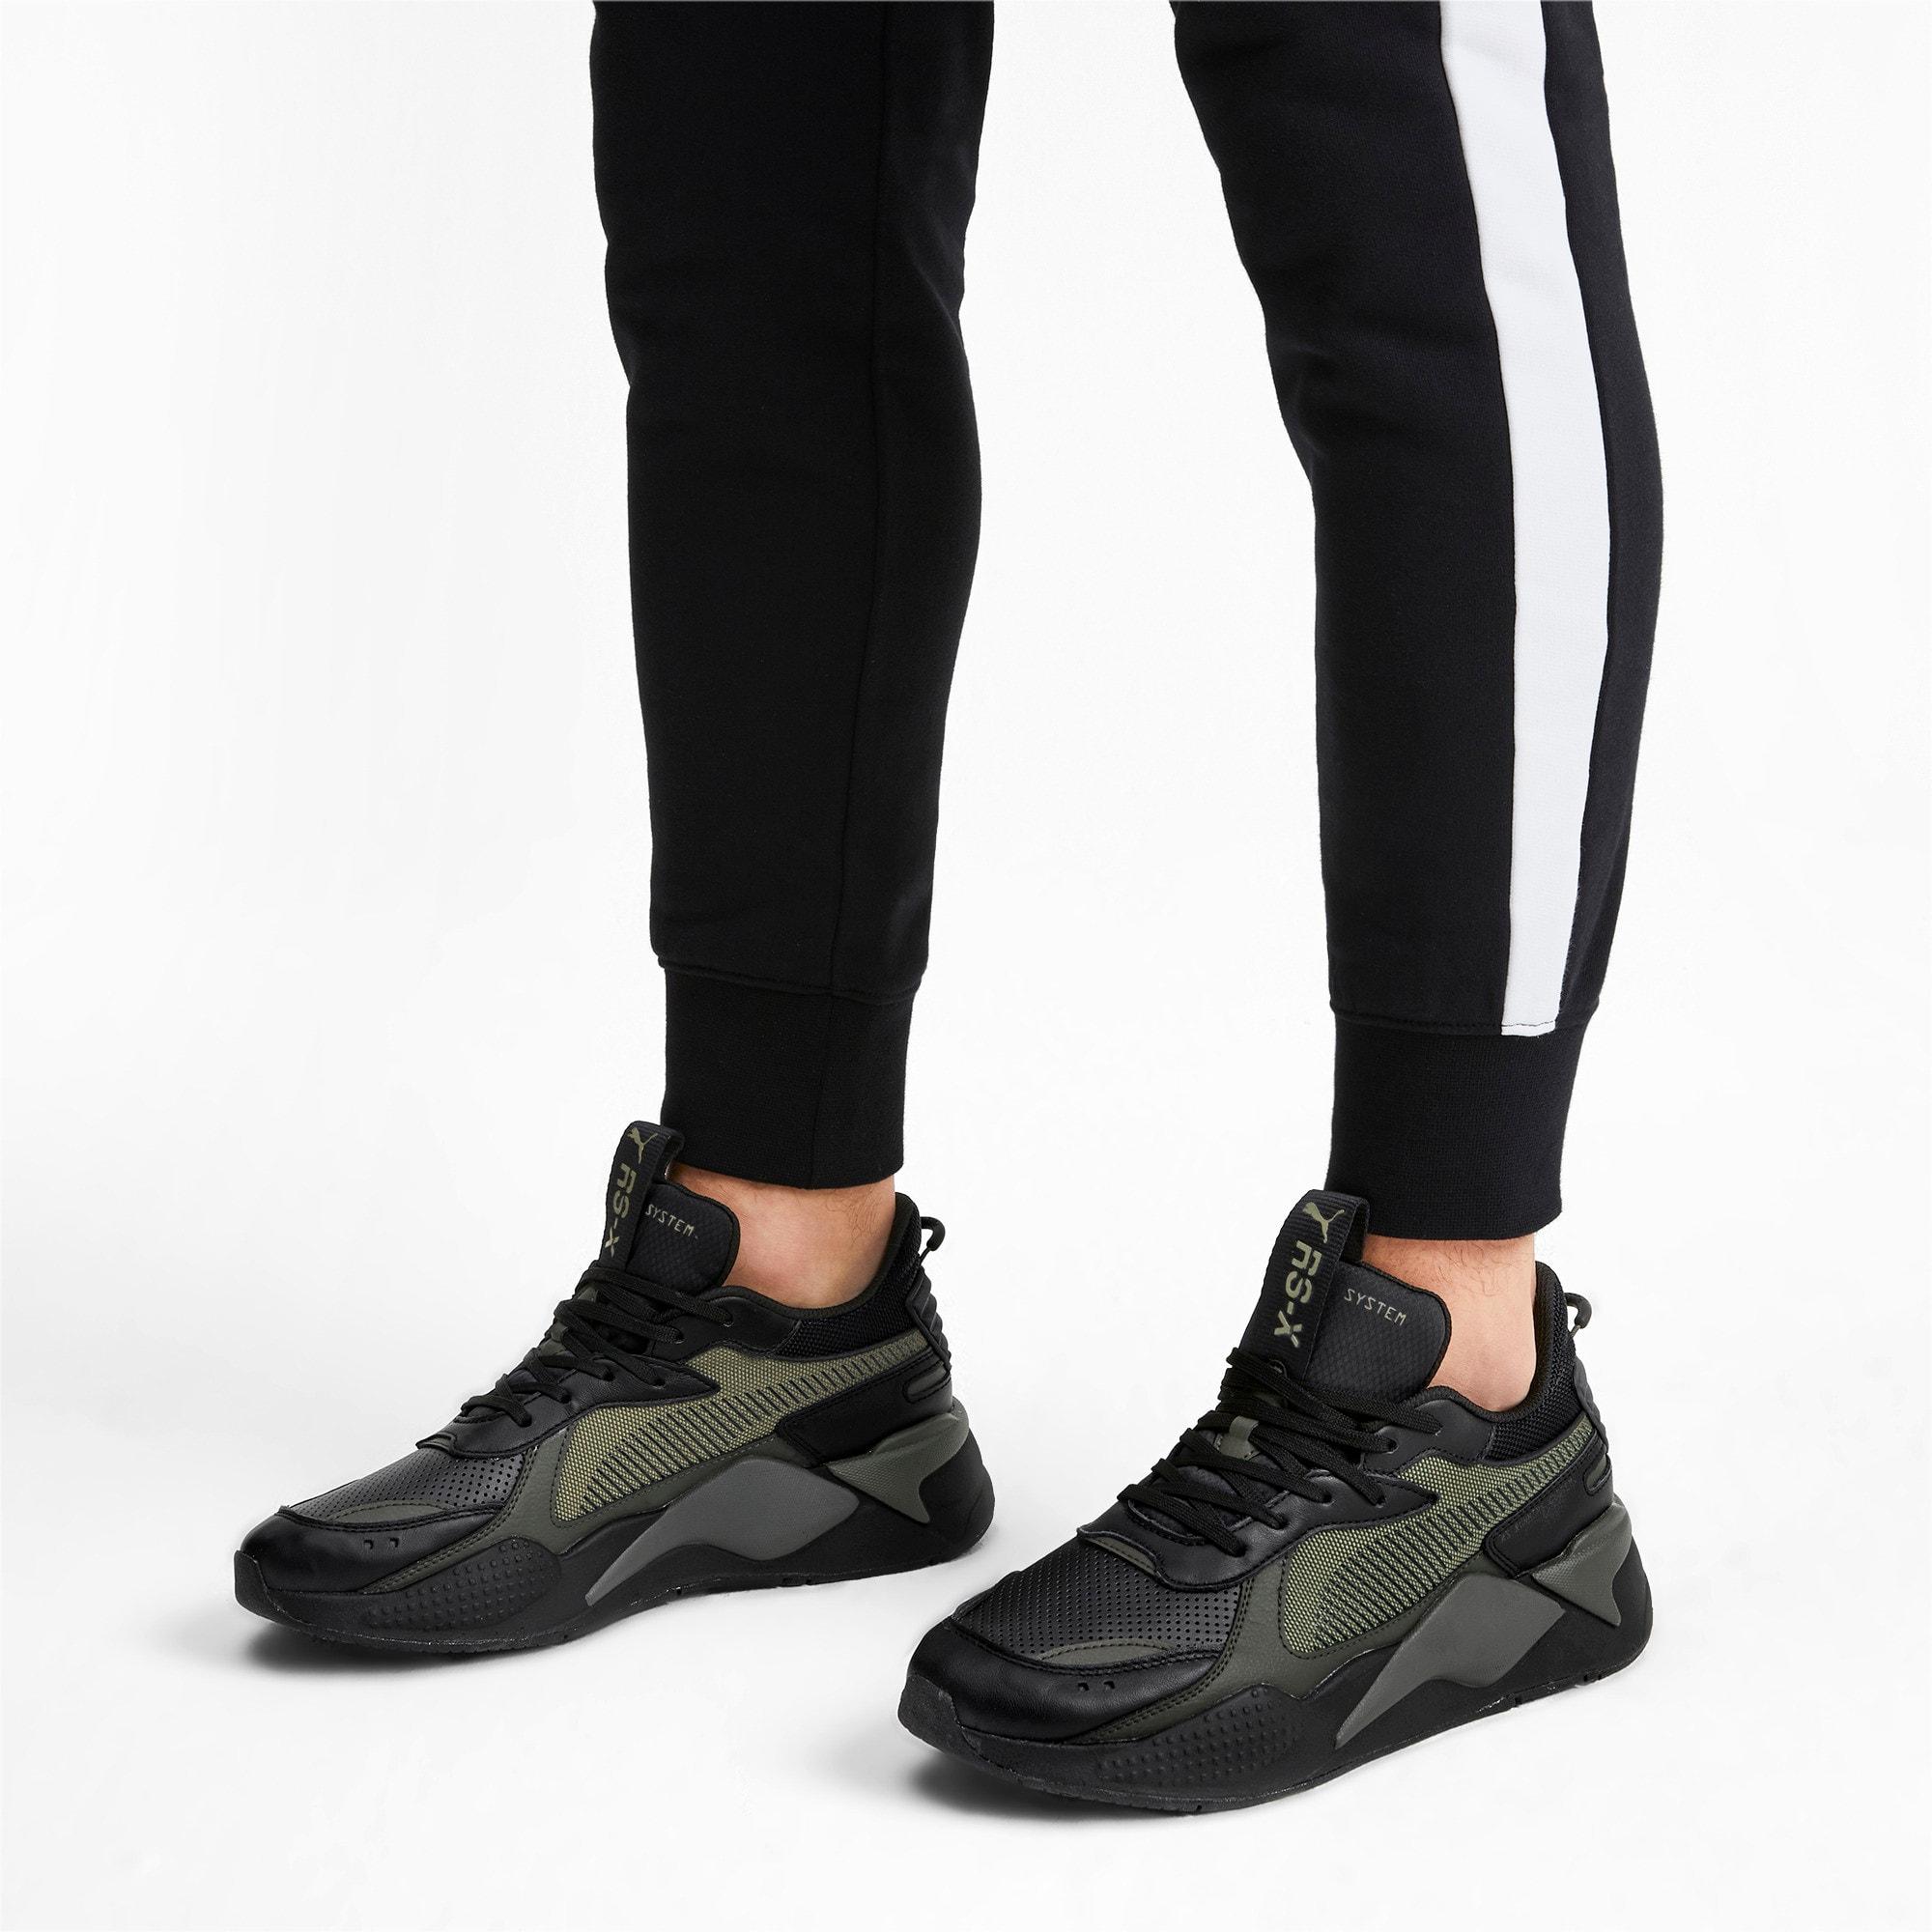 Thumbnail 2 of RS-X Winterized Sneakers, Puma Black-Burnt Olive, medium